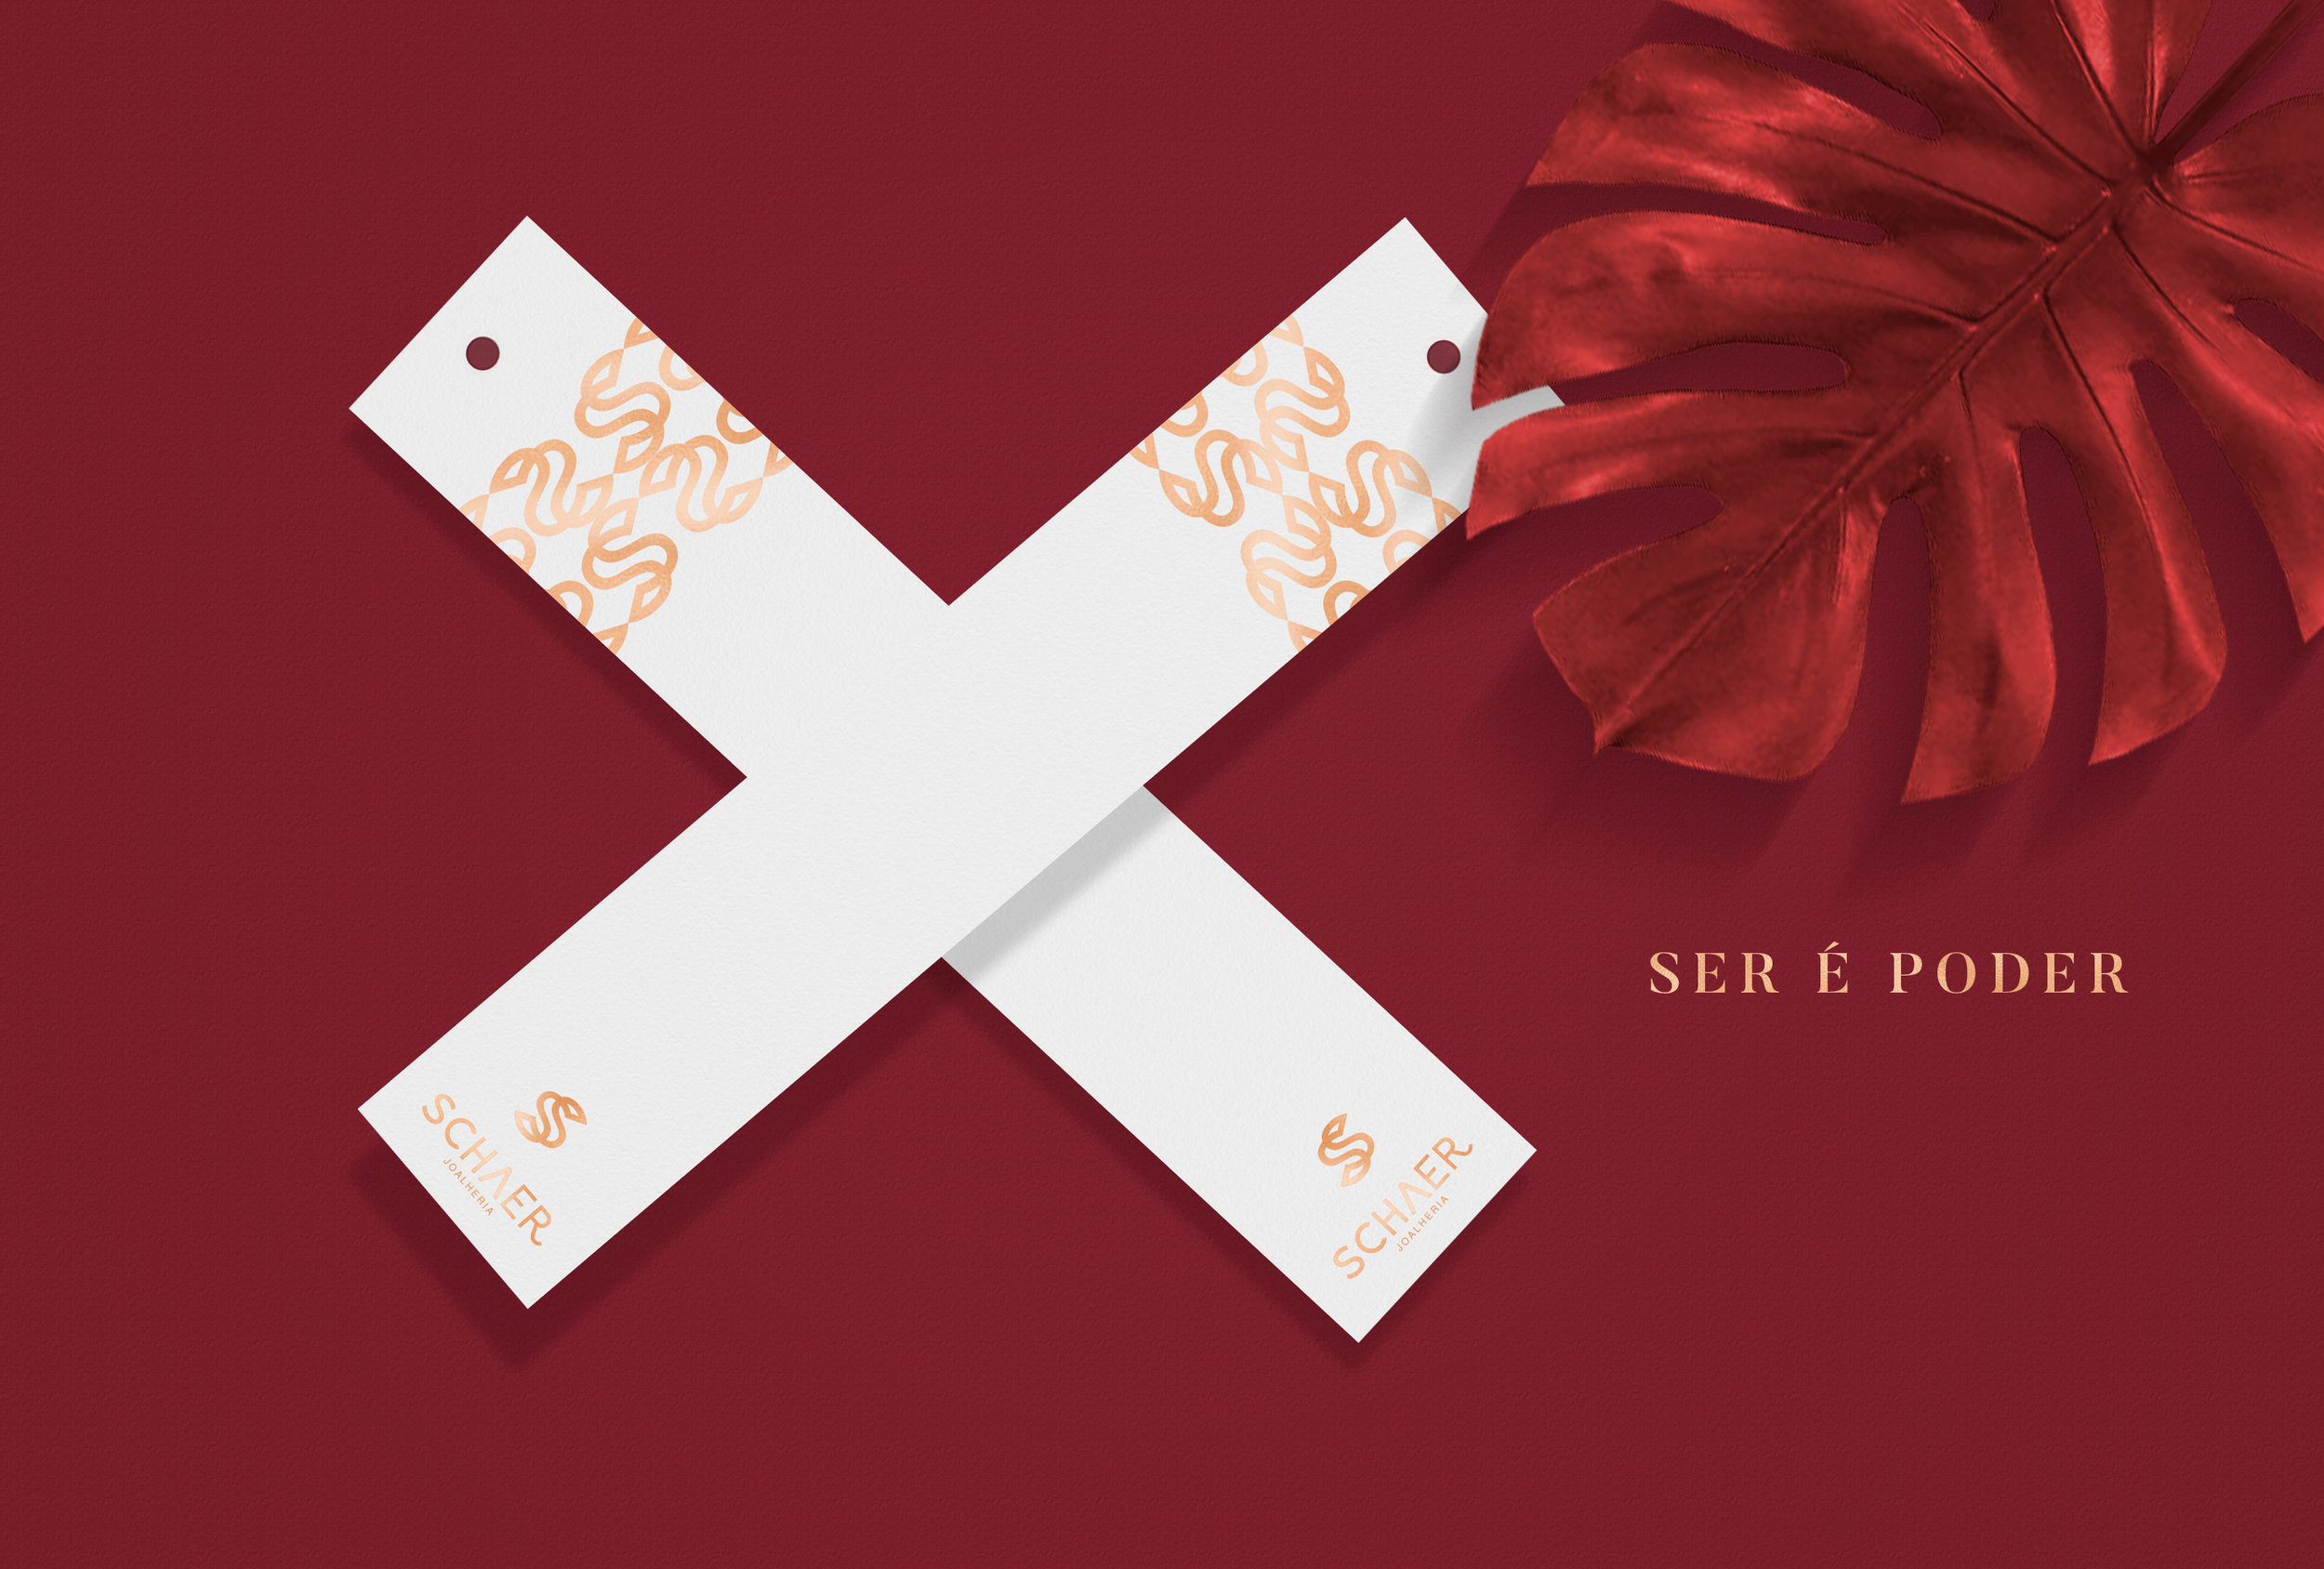 Jewelry to Enhance the Feminine Spirit / World Brand & Packaging Design Society